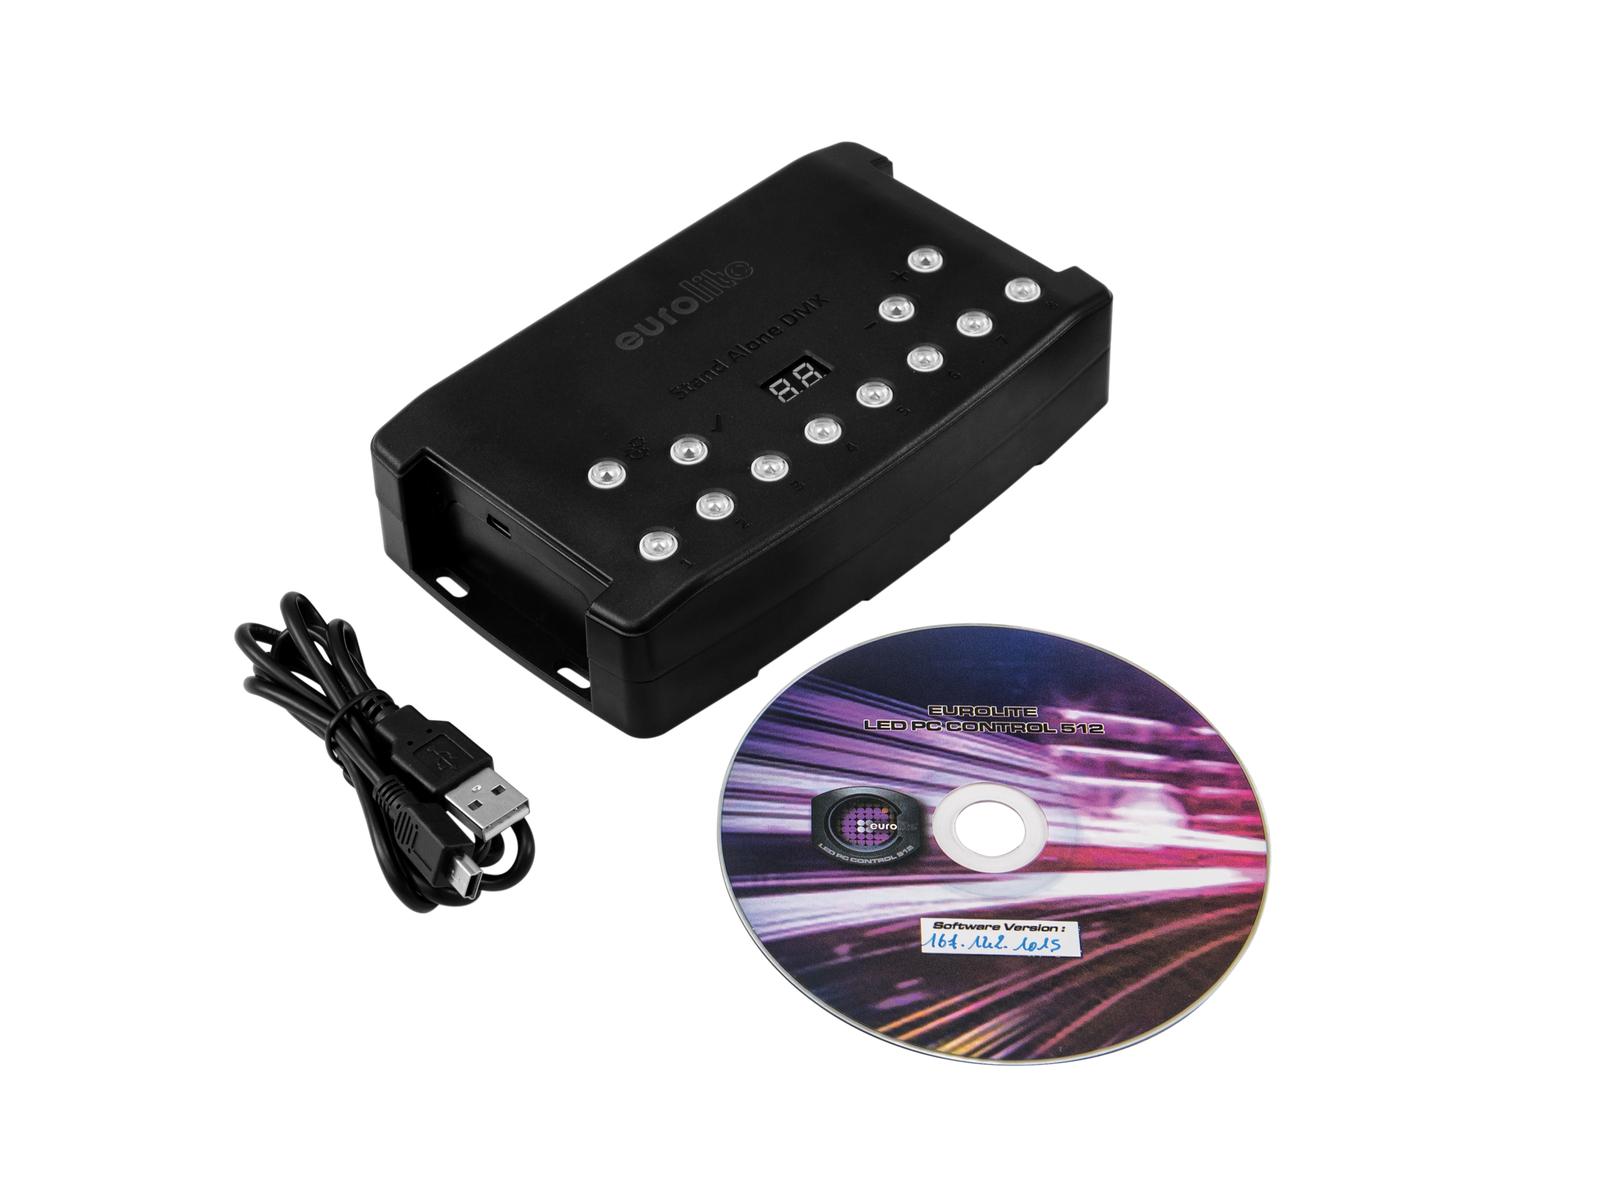 eurolite-sap-1024-mk2-standalone-player